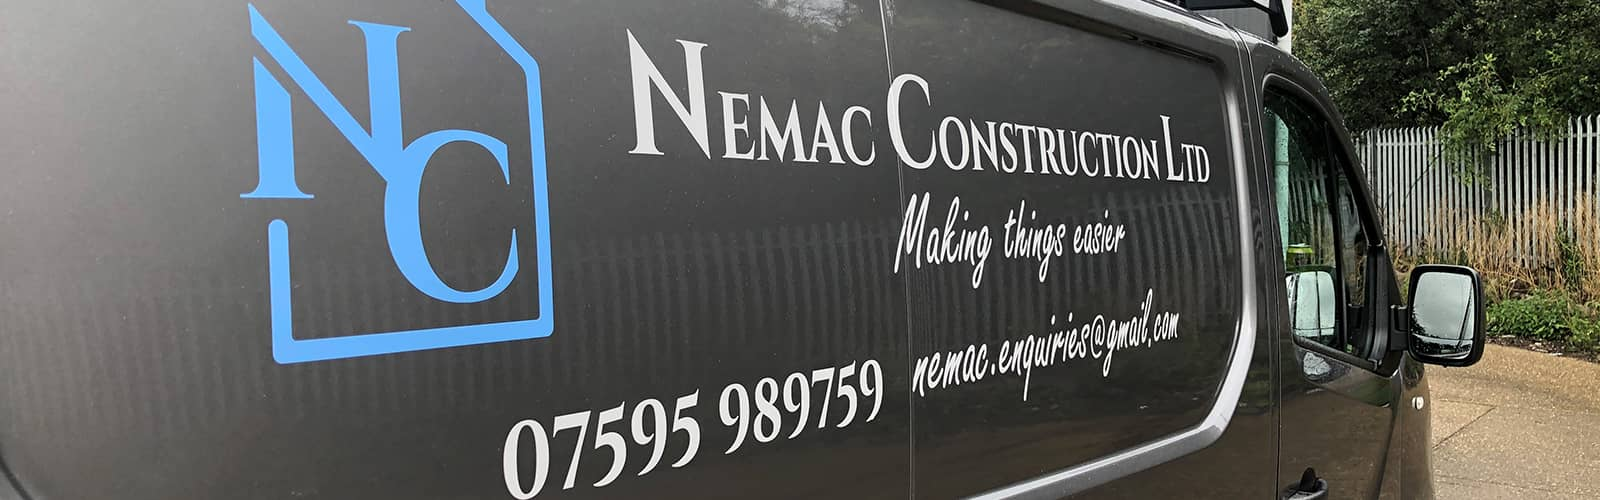 Construction Company Van Graphics for Tradesmen in Huntingdon